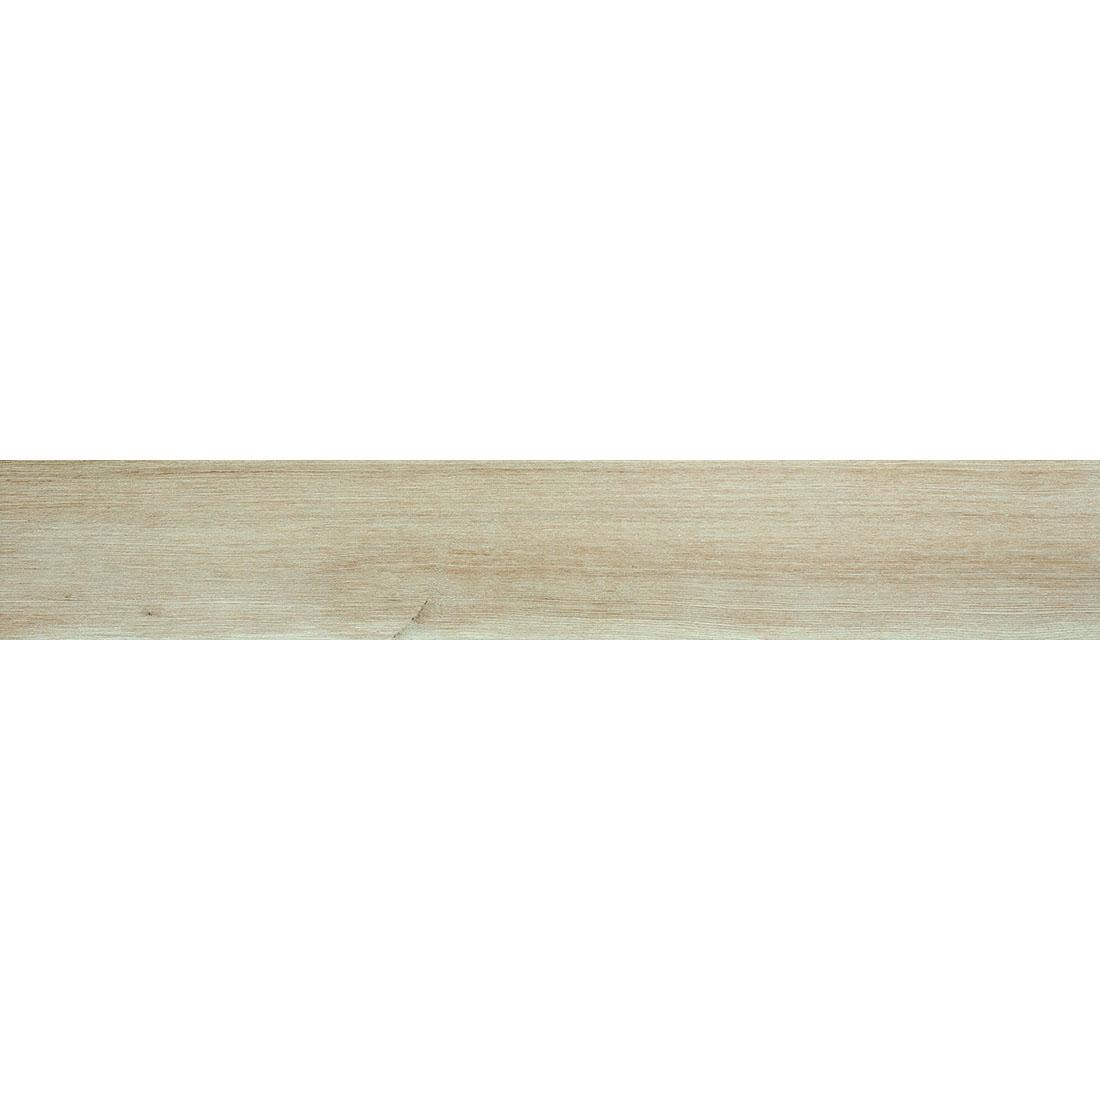 Firewood 20x120 Roble Matt